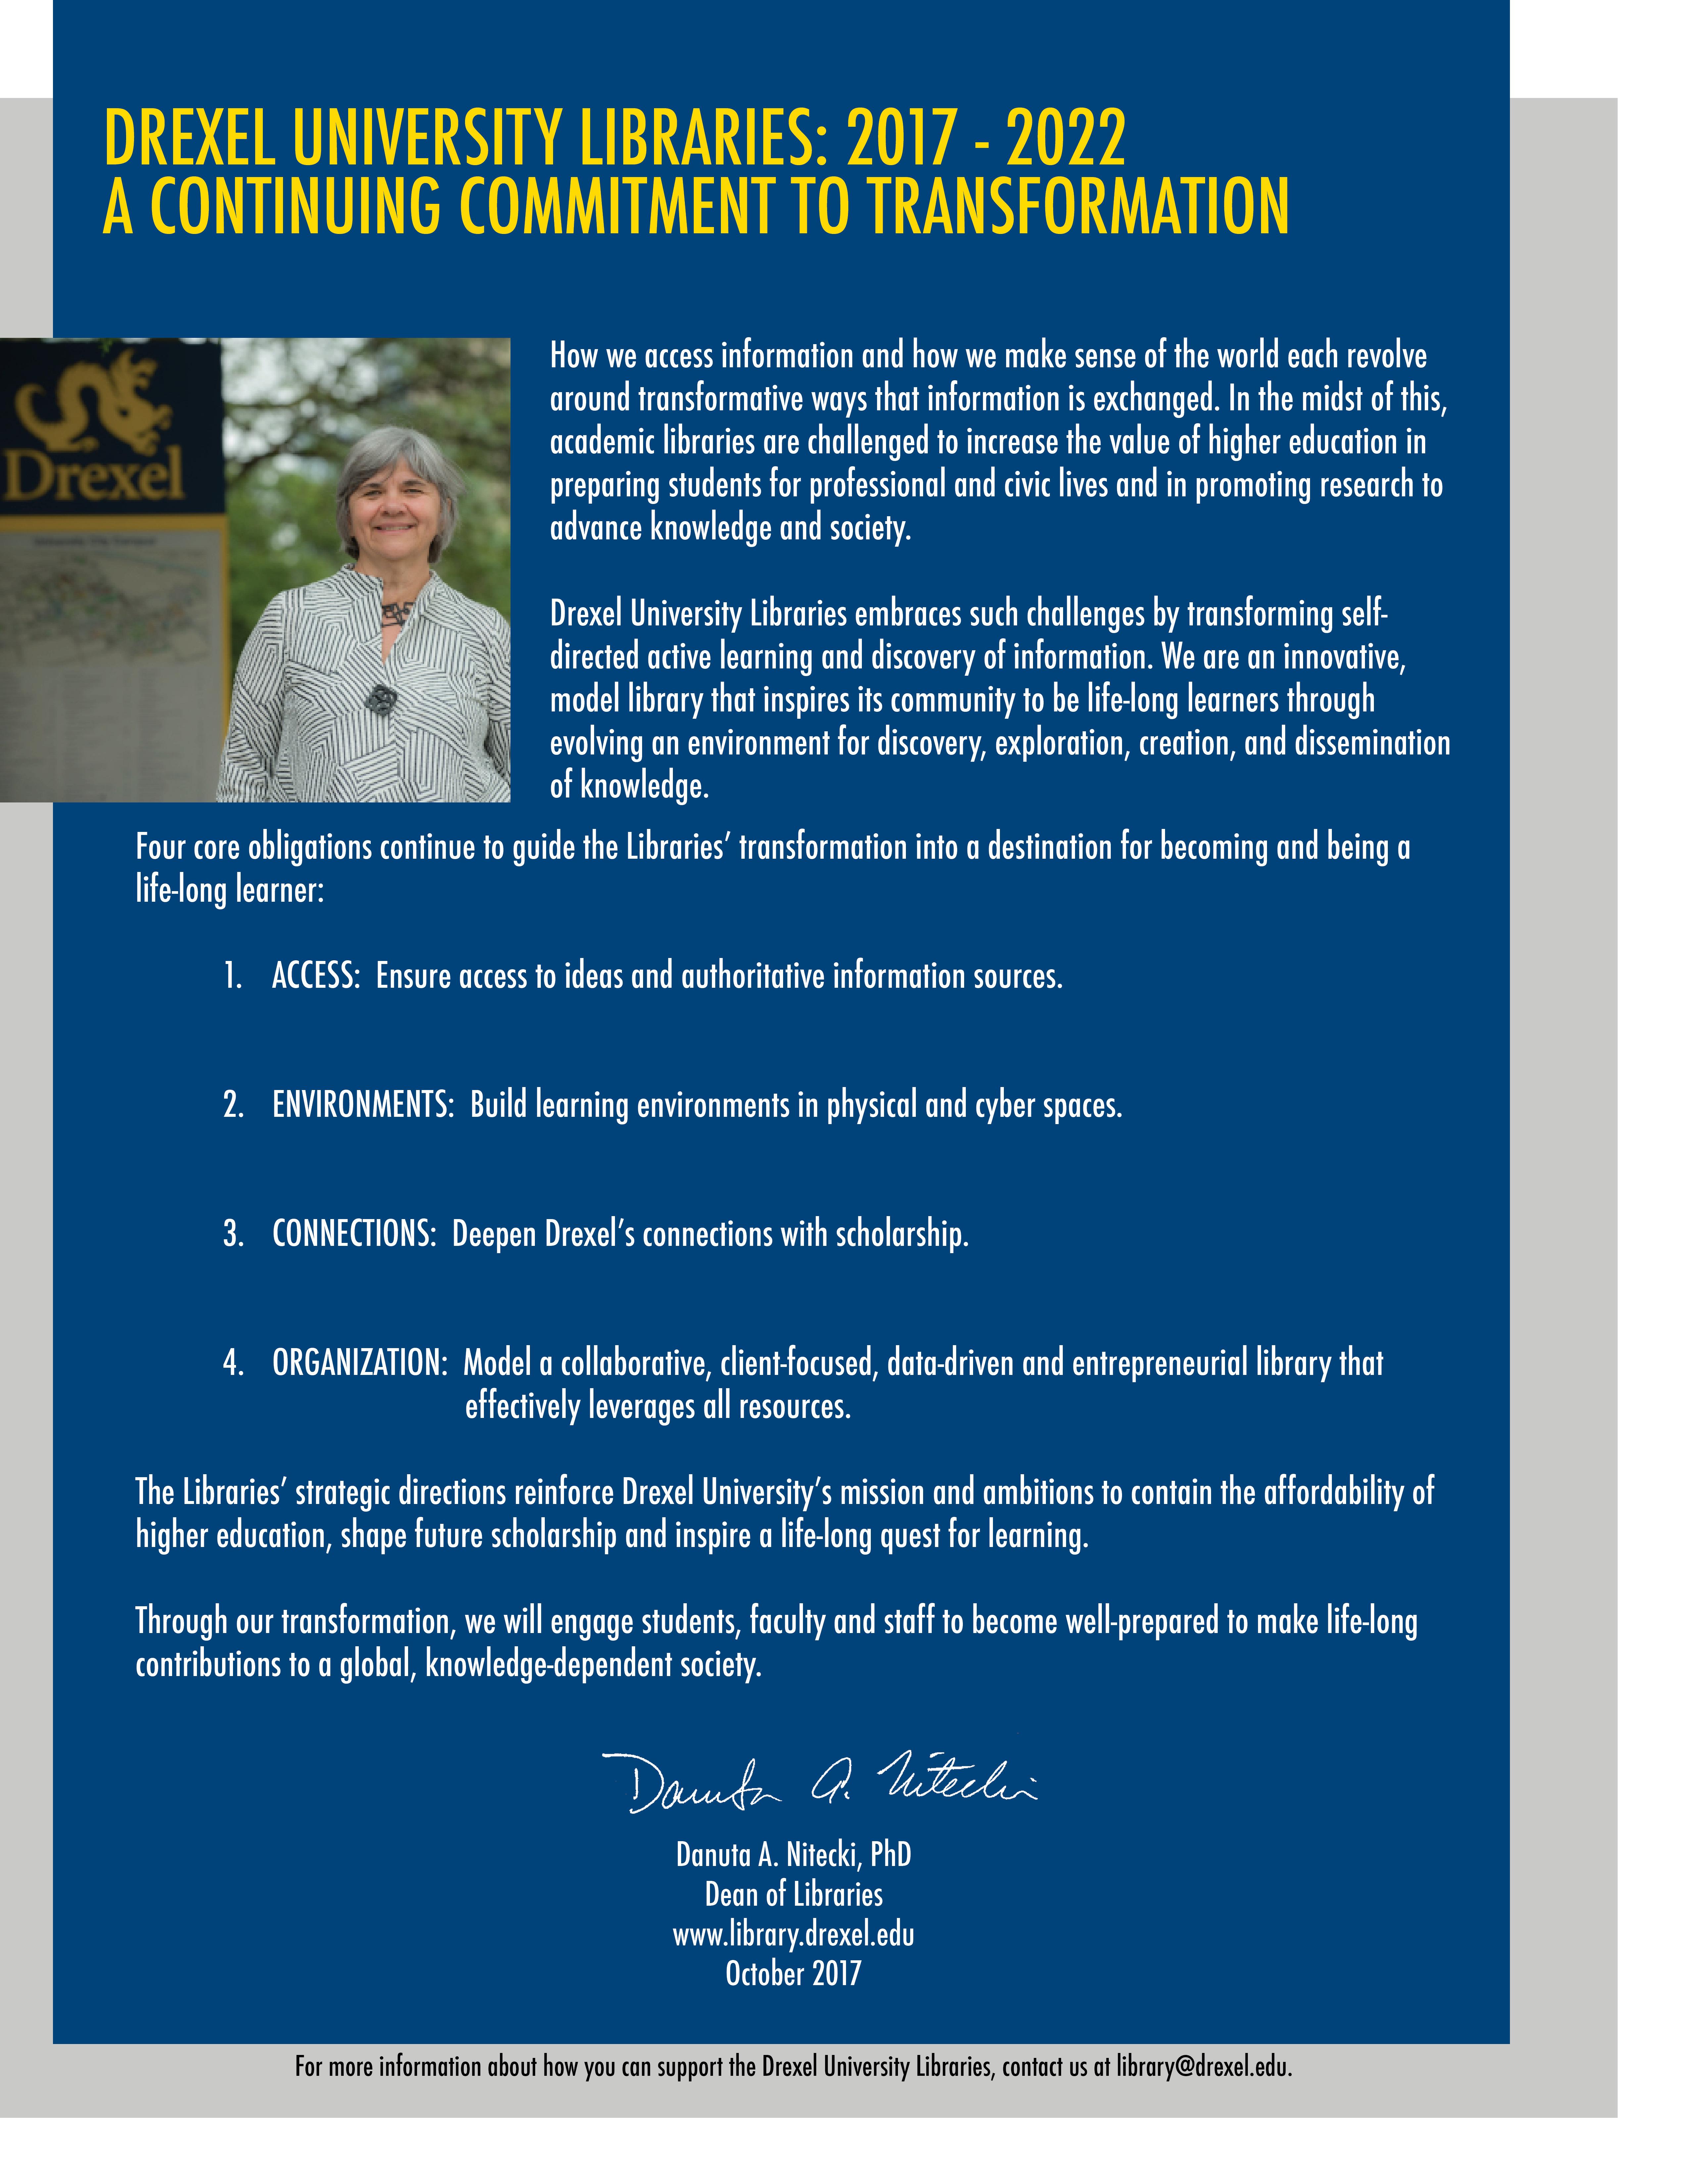 strategic plan drexel university